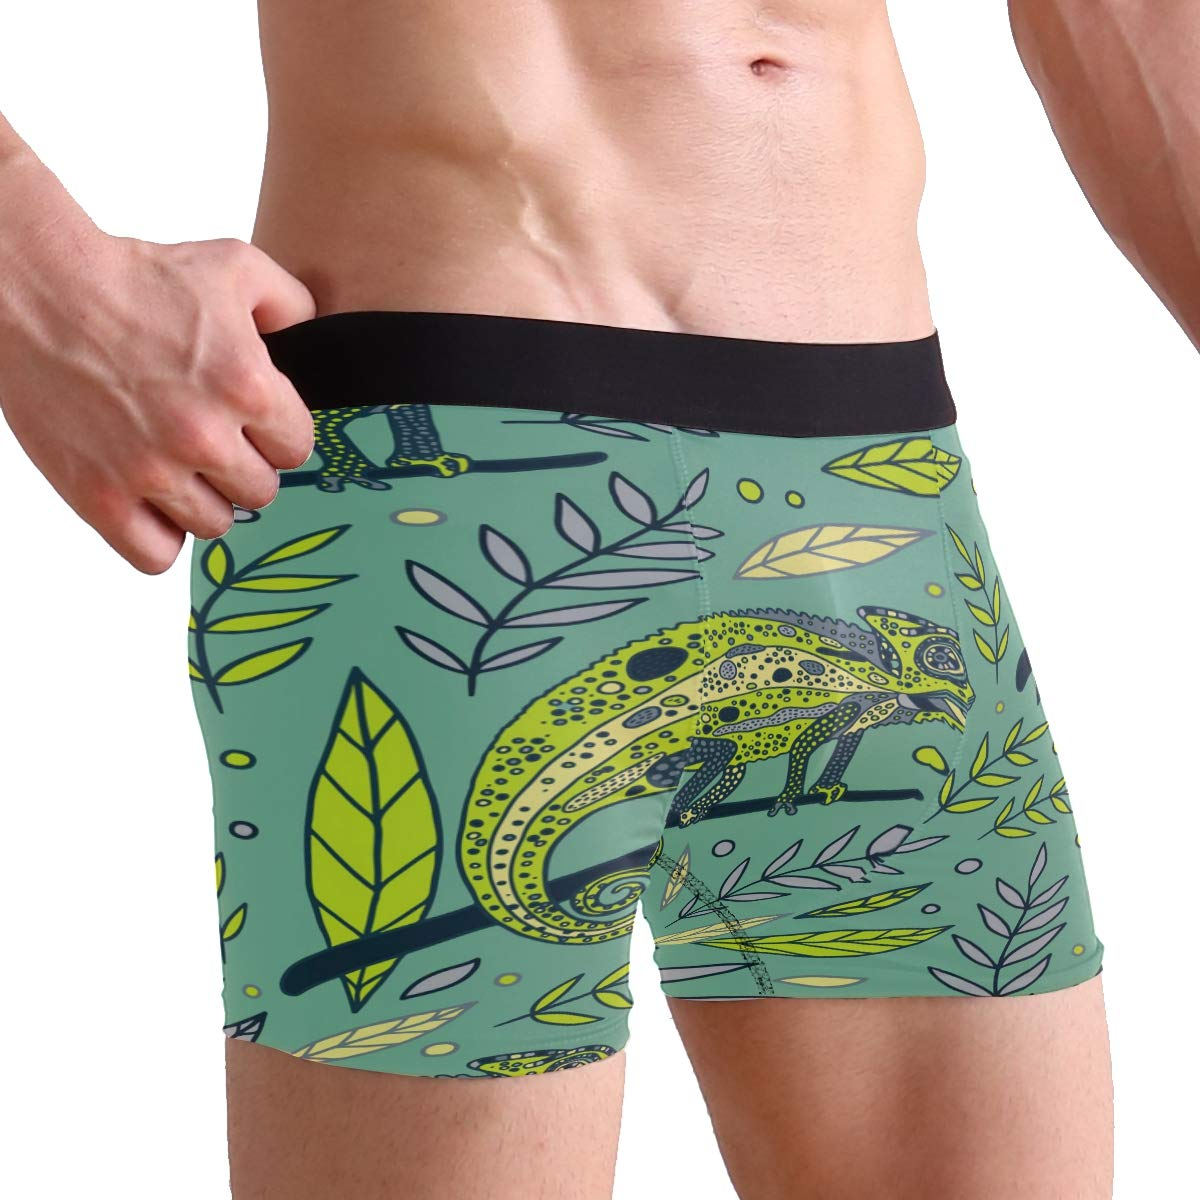 ZZKKO Chameleon Leaf Mens Boxer Briefs Underwear Breathable Stretch Boxer Trunk with Pouch S-XL